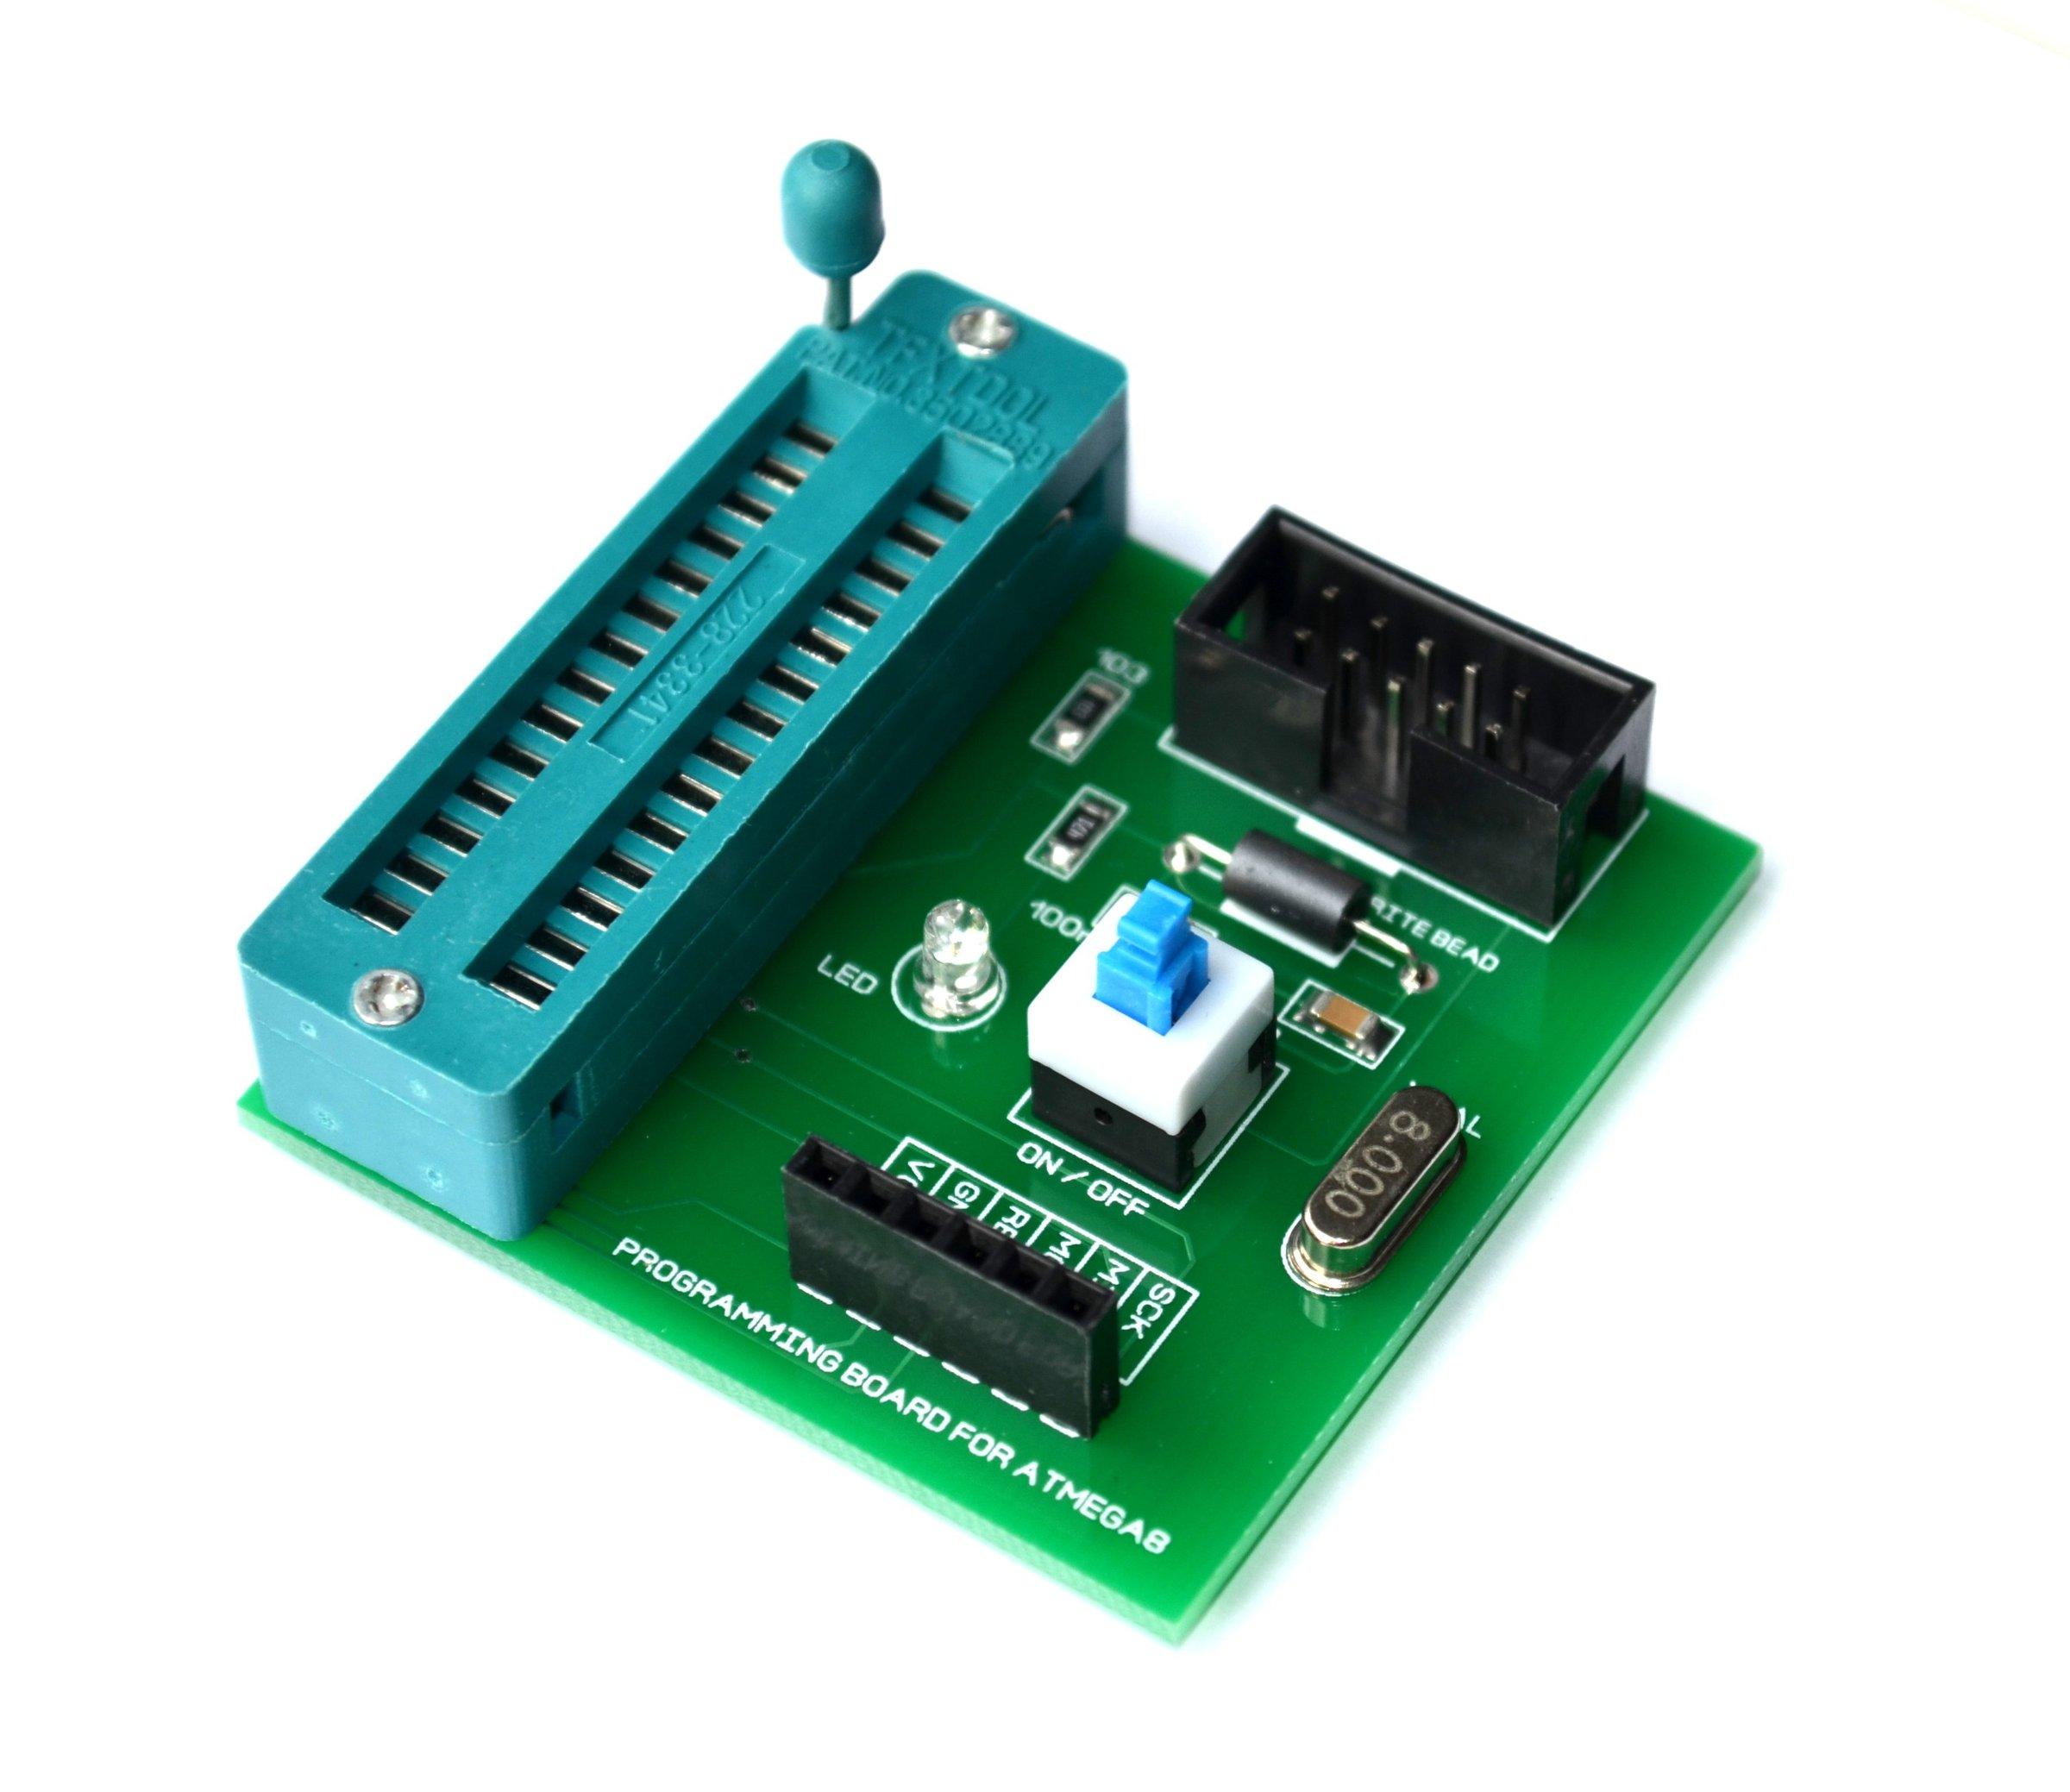 Atmel Avr Programming Board Isp From Krida Electronics On Tindie Usb Programmer Using Atmega8 1